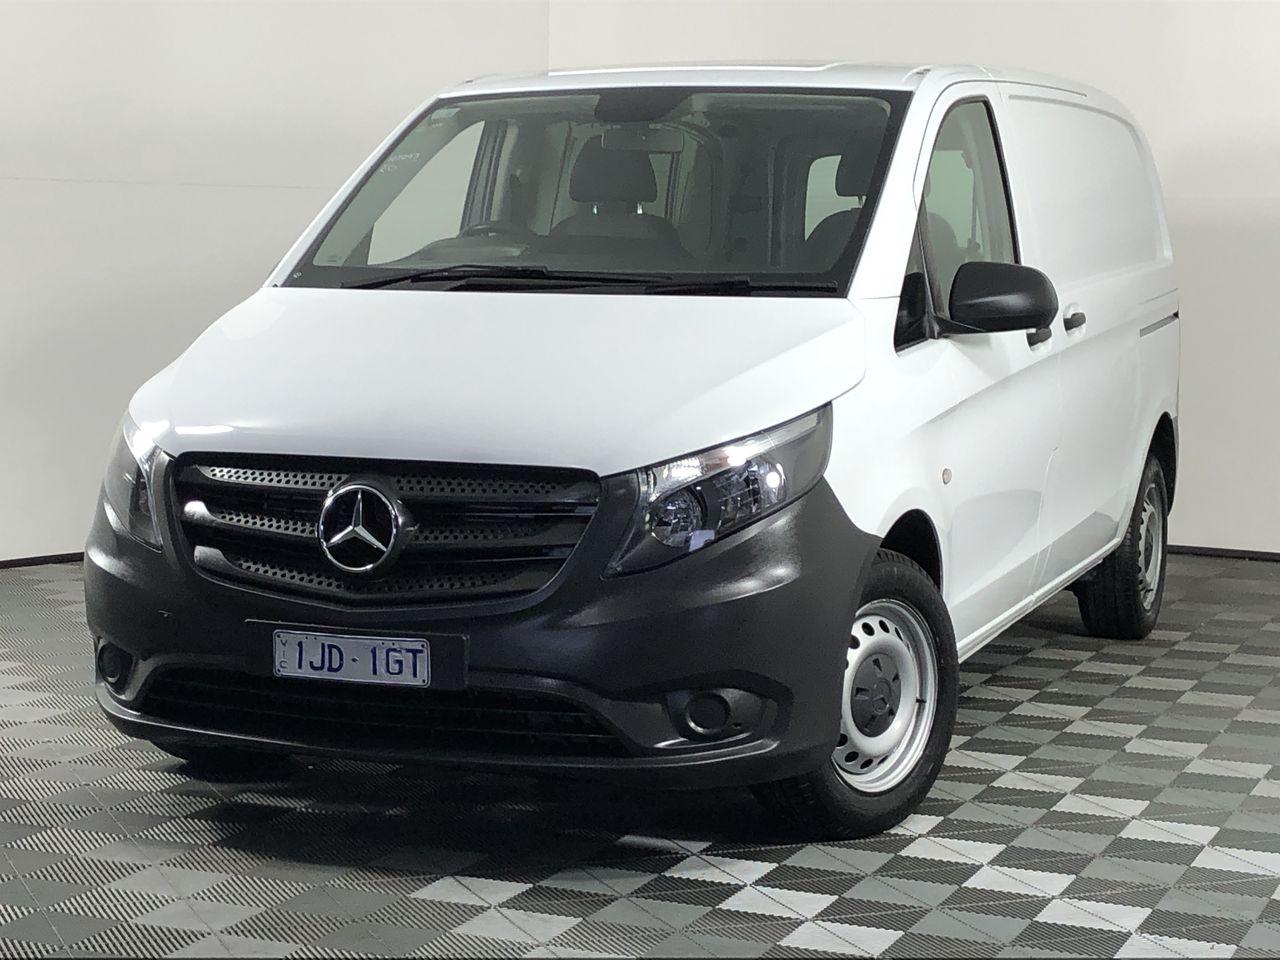 2017 Mercedes Benz Vito 111 CDI Turbo Diesel Manual Van